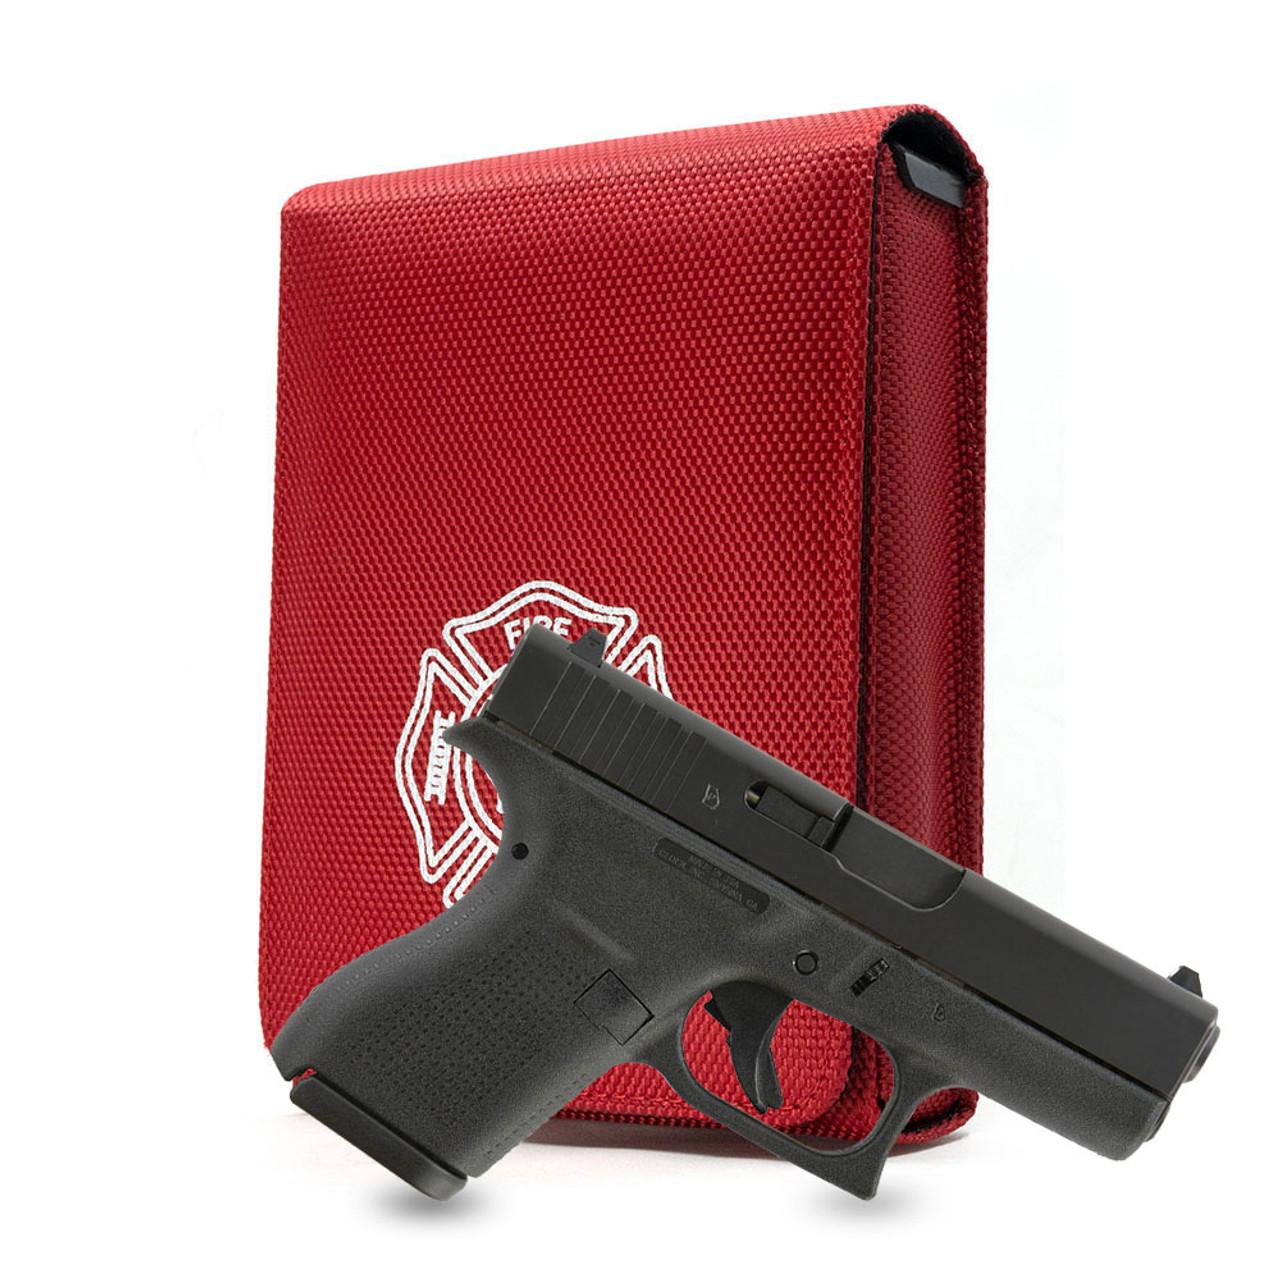 Glock 42 Red Covert Series Holster